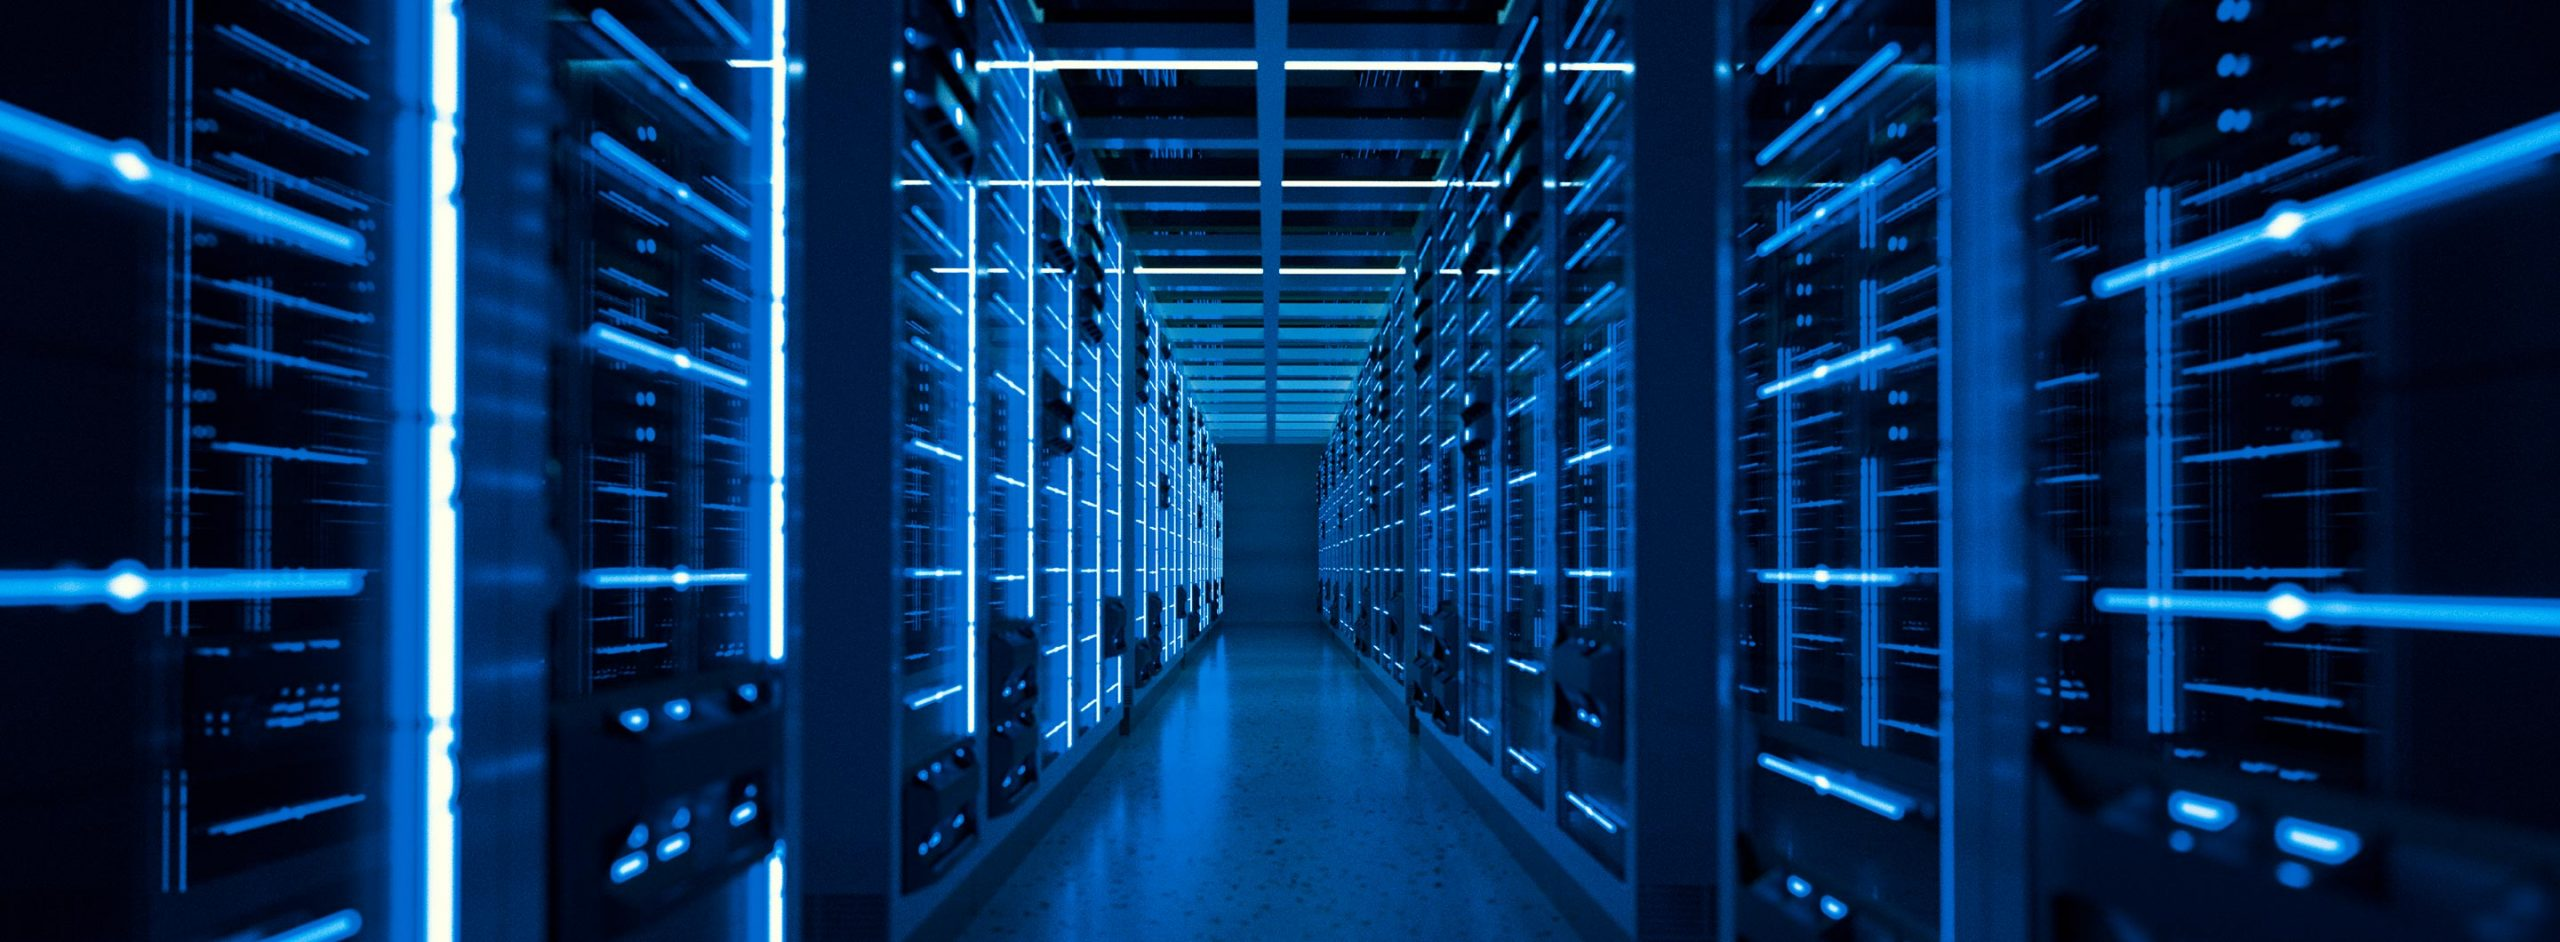 whitepaper banner image for data stack modernization in the cloud